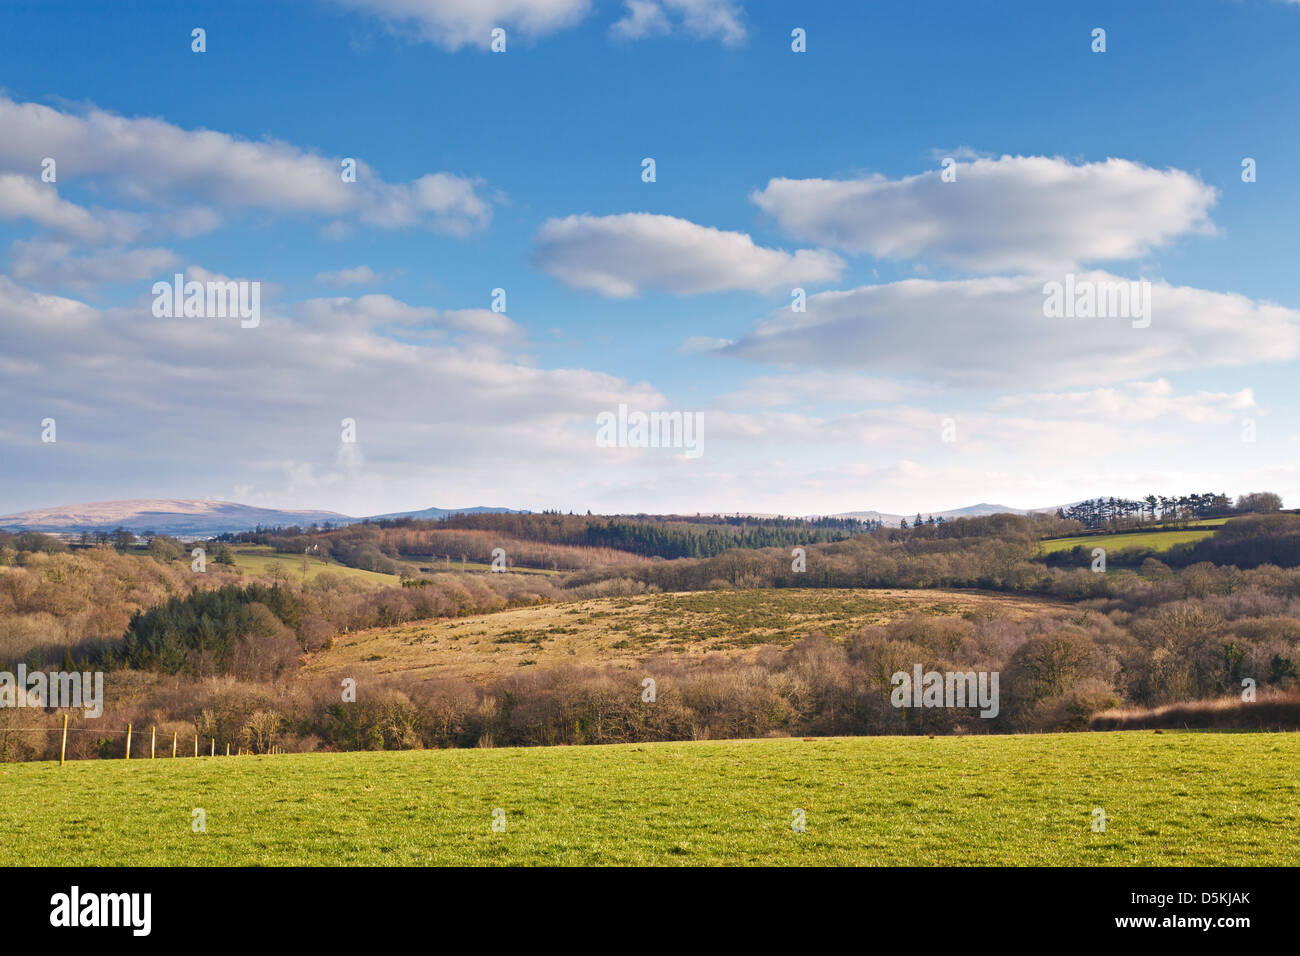 Dartmoor National Park as seen from the hills above Jacobstowe near Okehampton in Devon - Stock Image